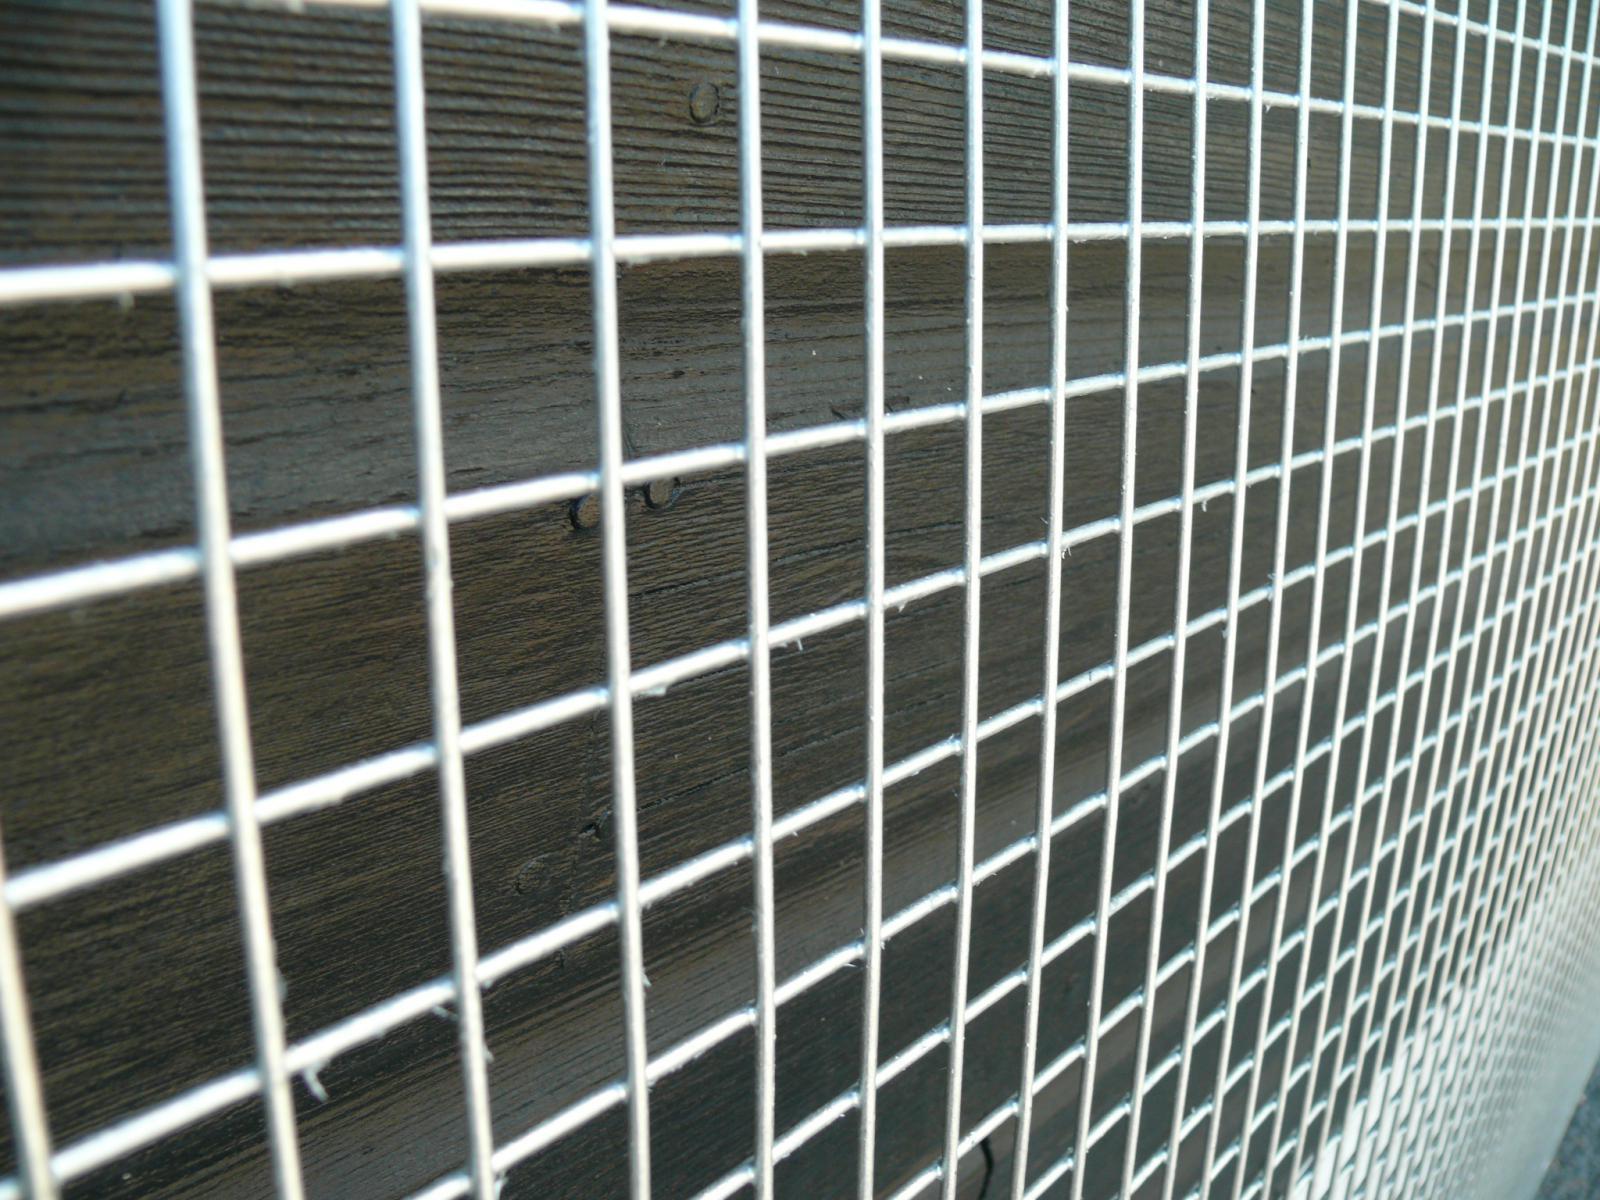 5x Welded Wire Mesh Panels 1 2x2 4m Galvanised 4x8ft Steel